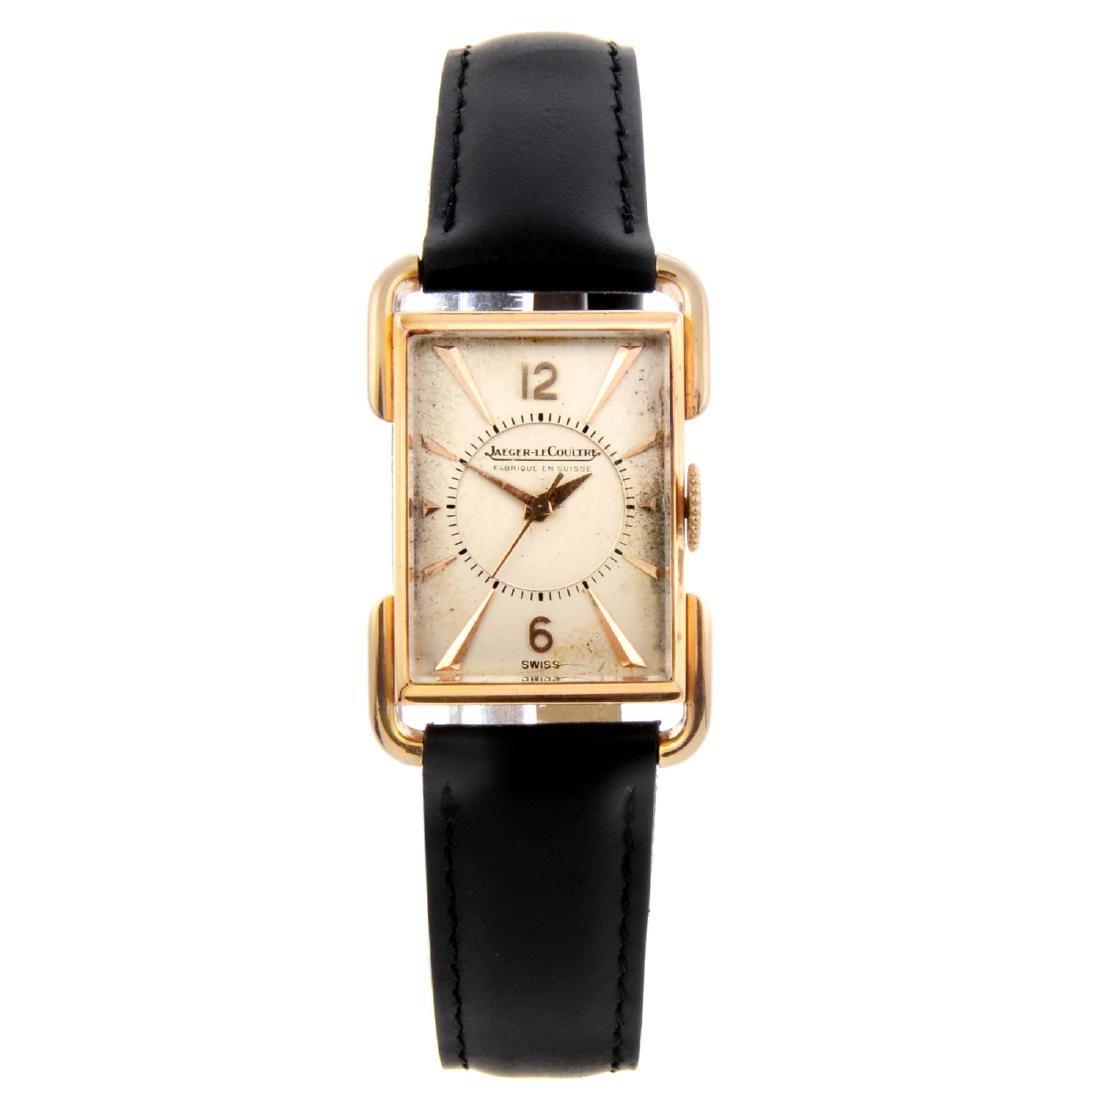 JAEGER-LECOULTRE - a lady's wrist watch. Yellow metal